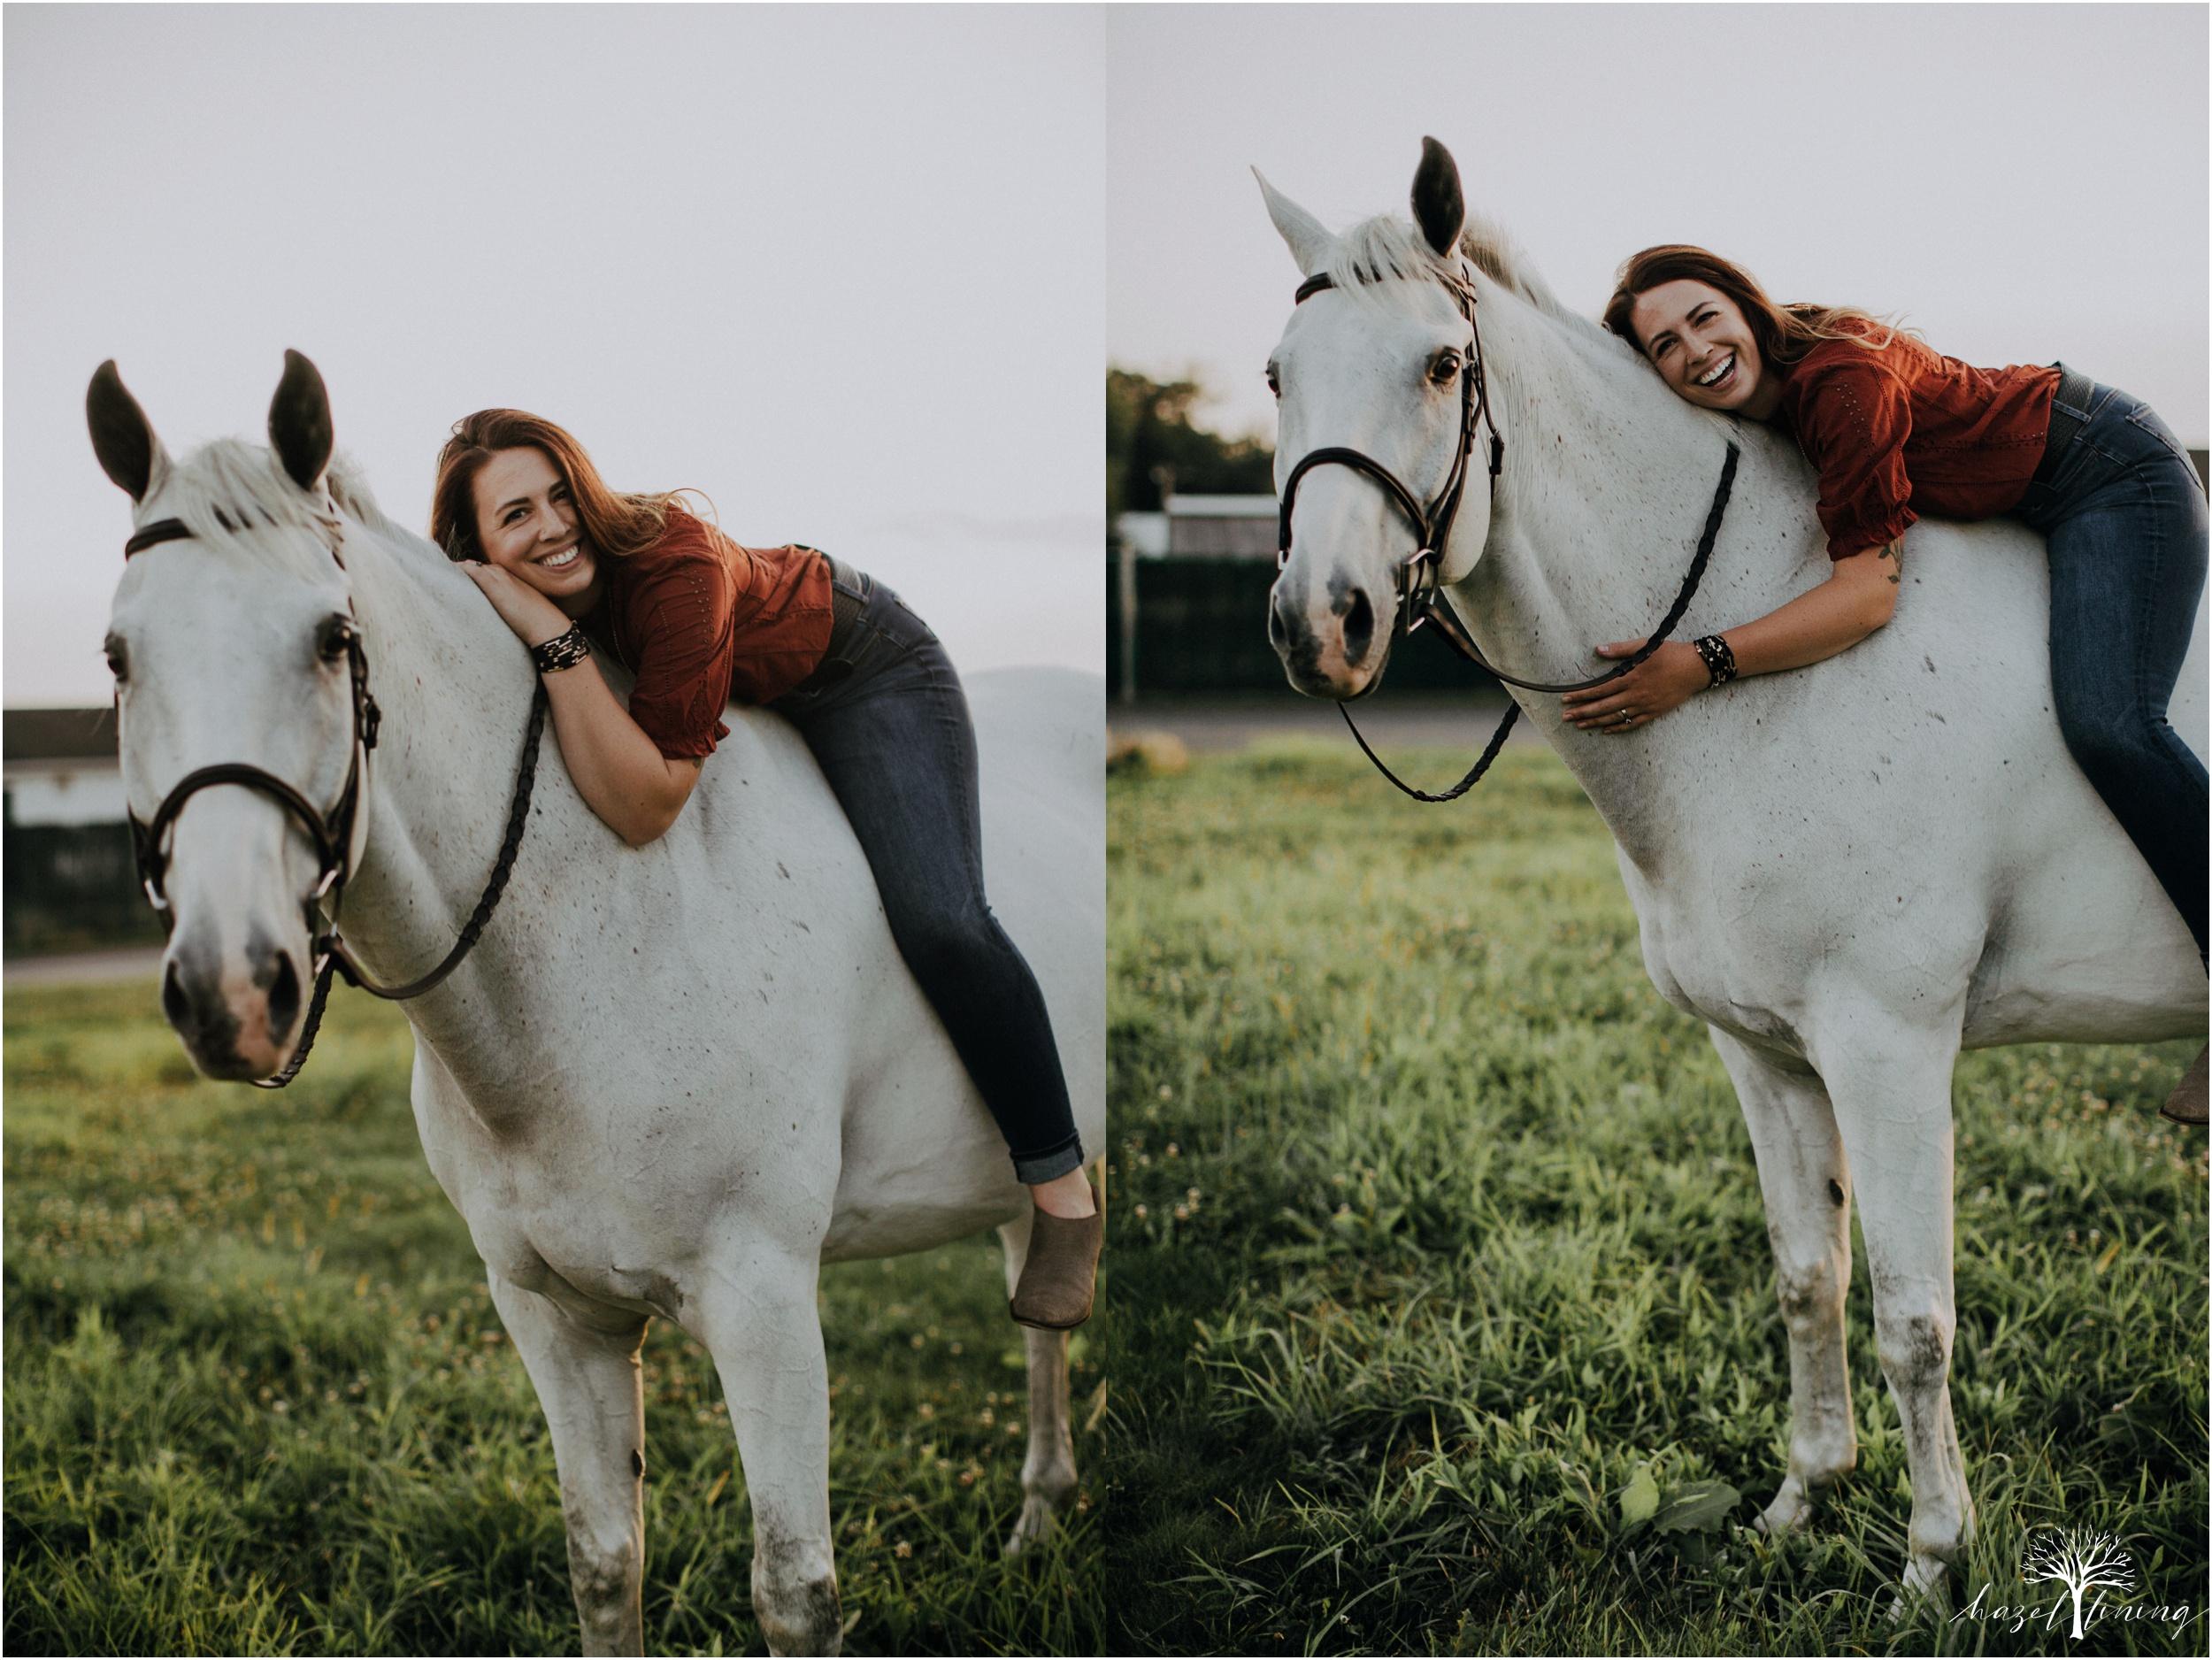 taylor-adams-and-horse-delaware-valley-university-delval-summer-equestrian-portrait-session-hazel-lining-photography-destination-elopement-wedding-engagement-photography_0036.jpg